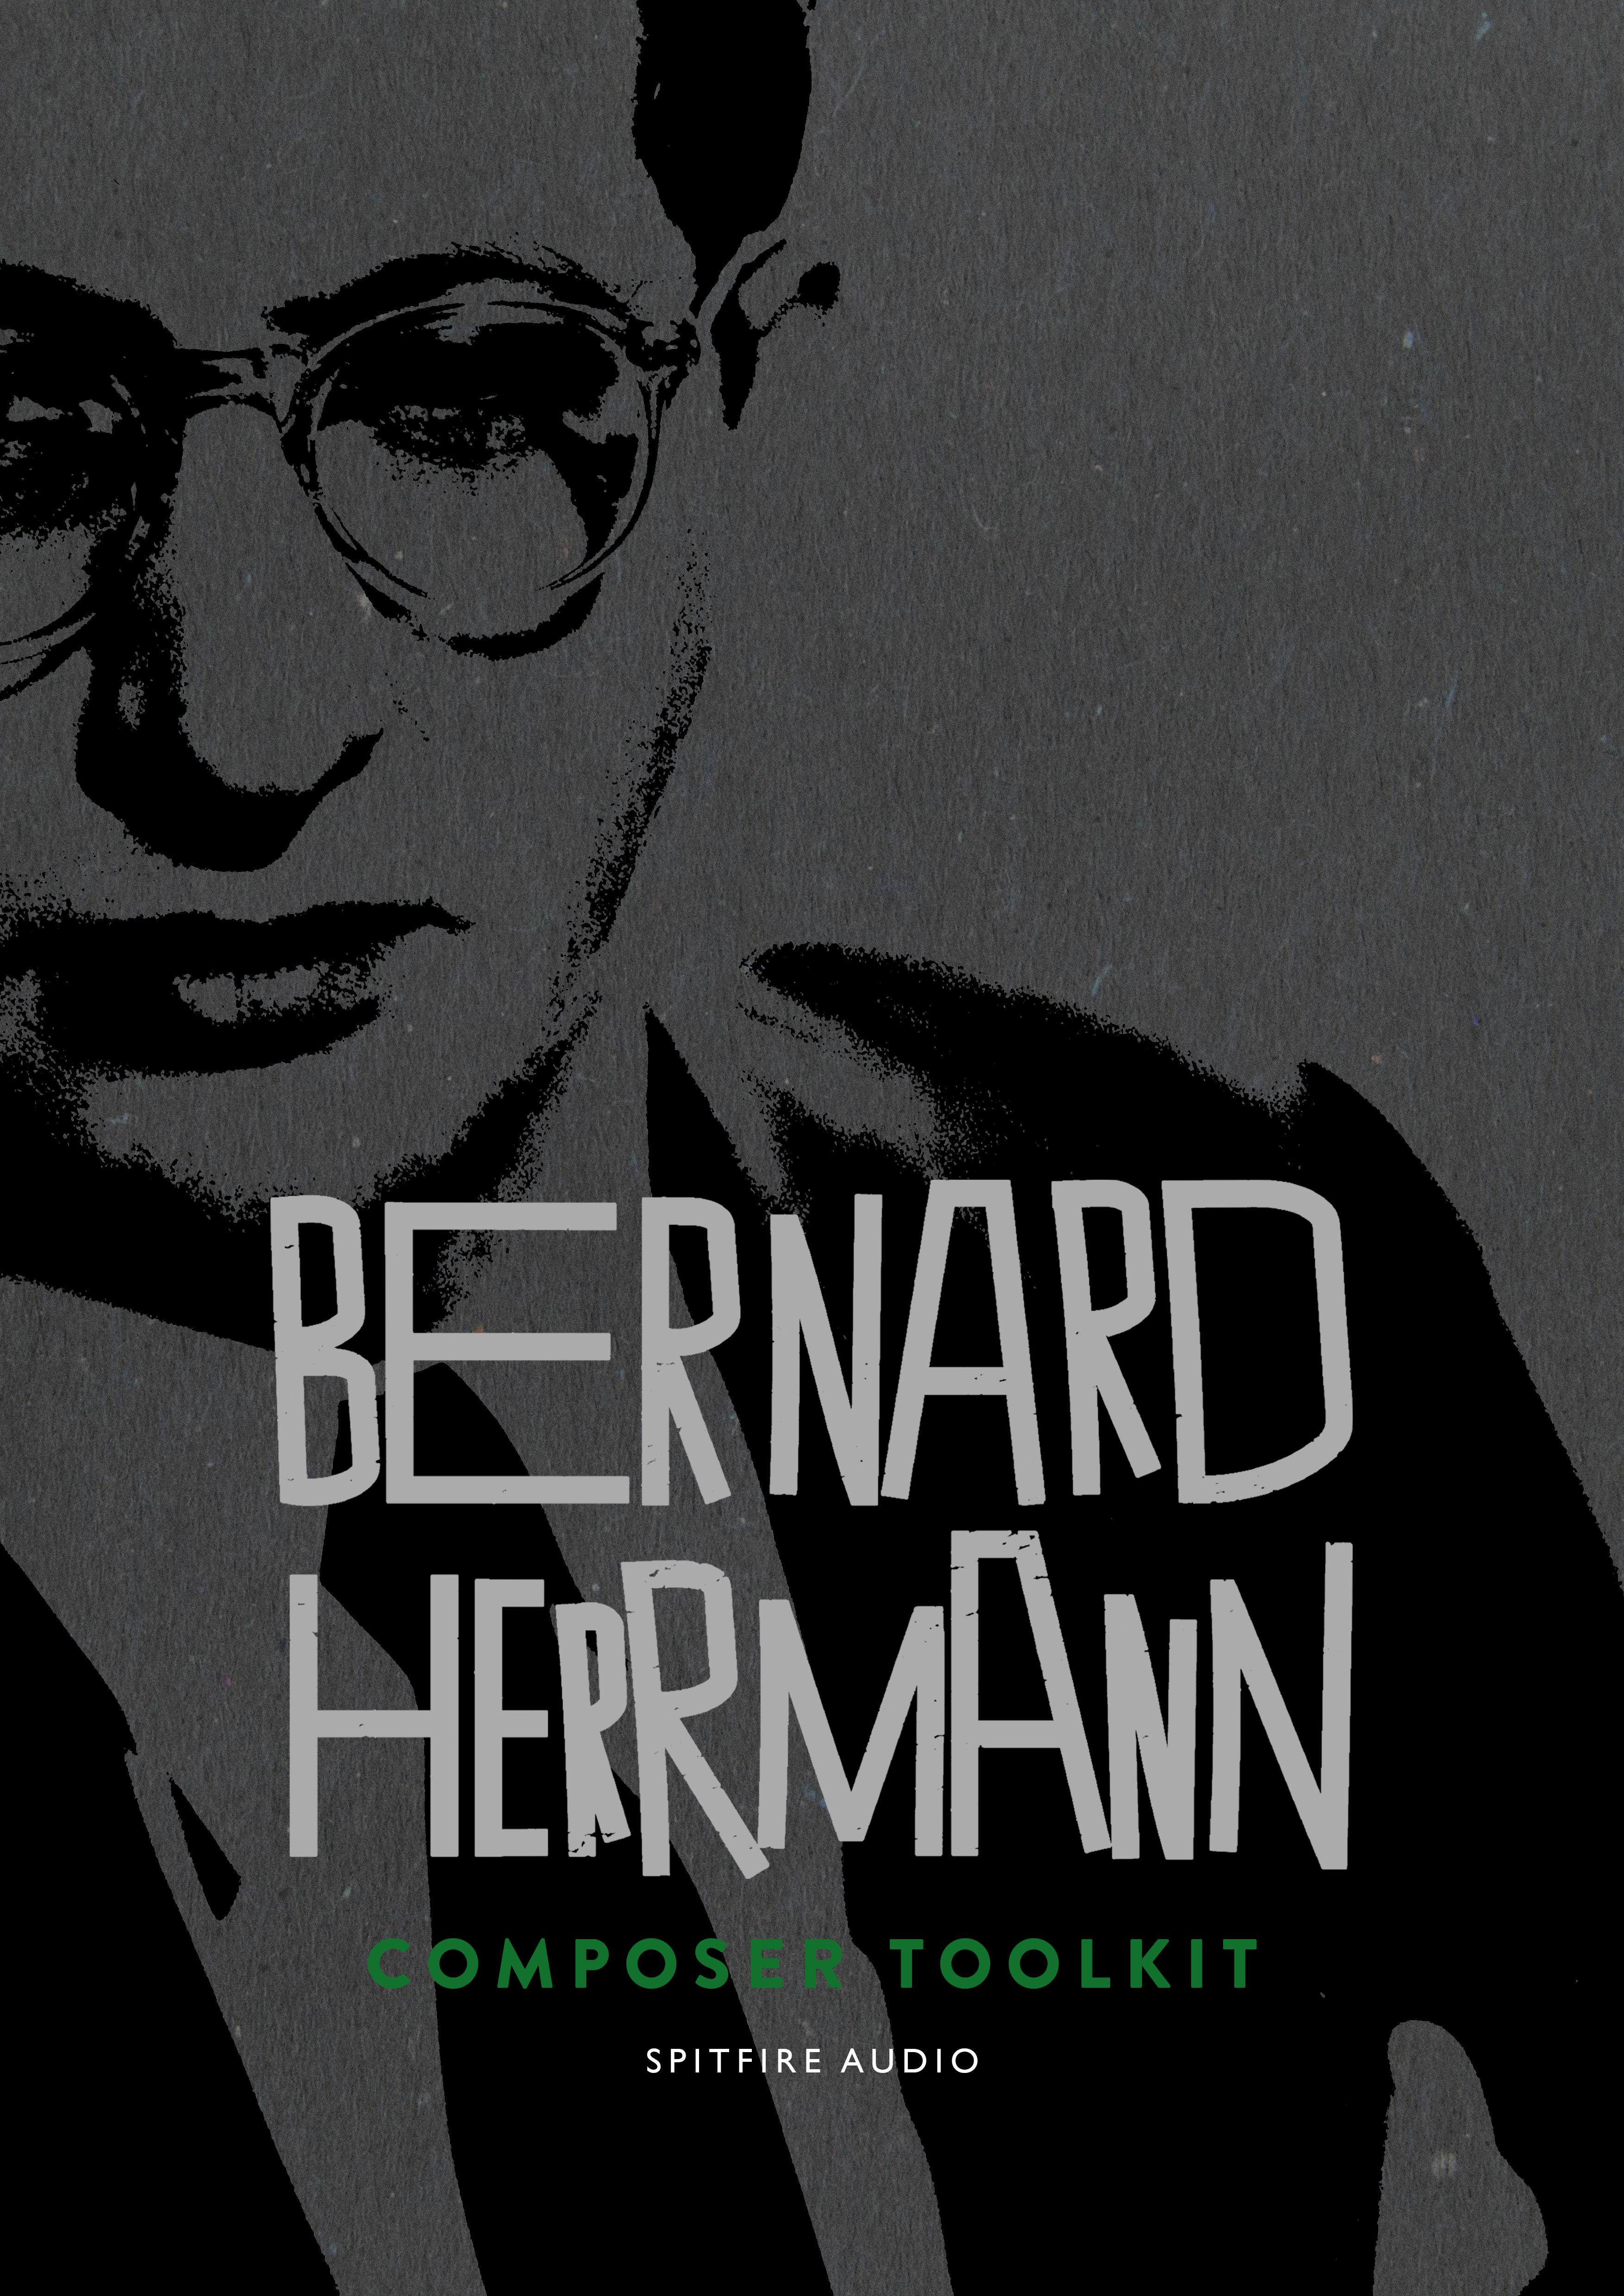 bernard herrmann composer toolkit